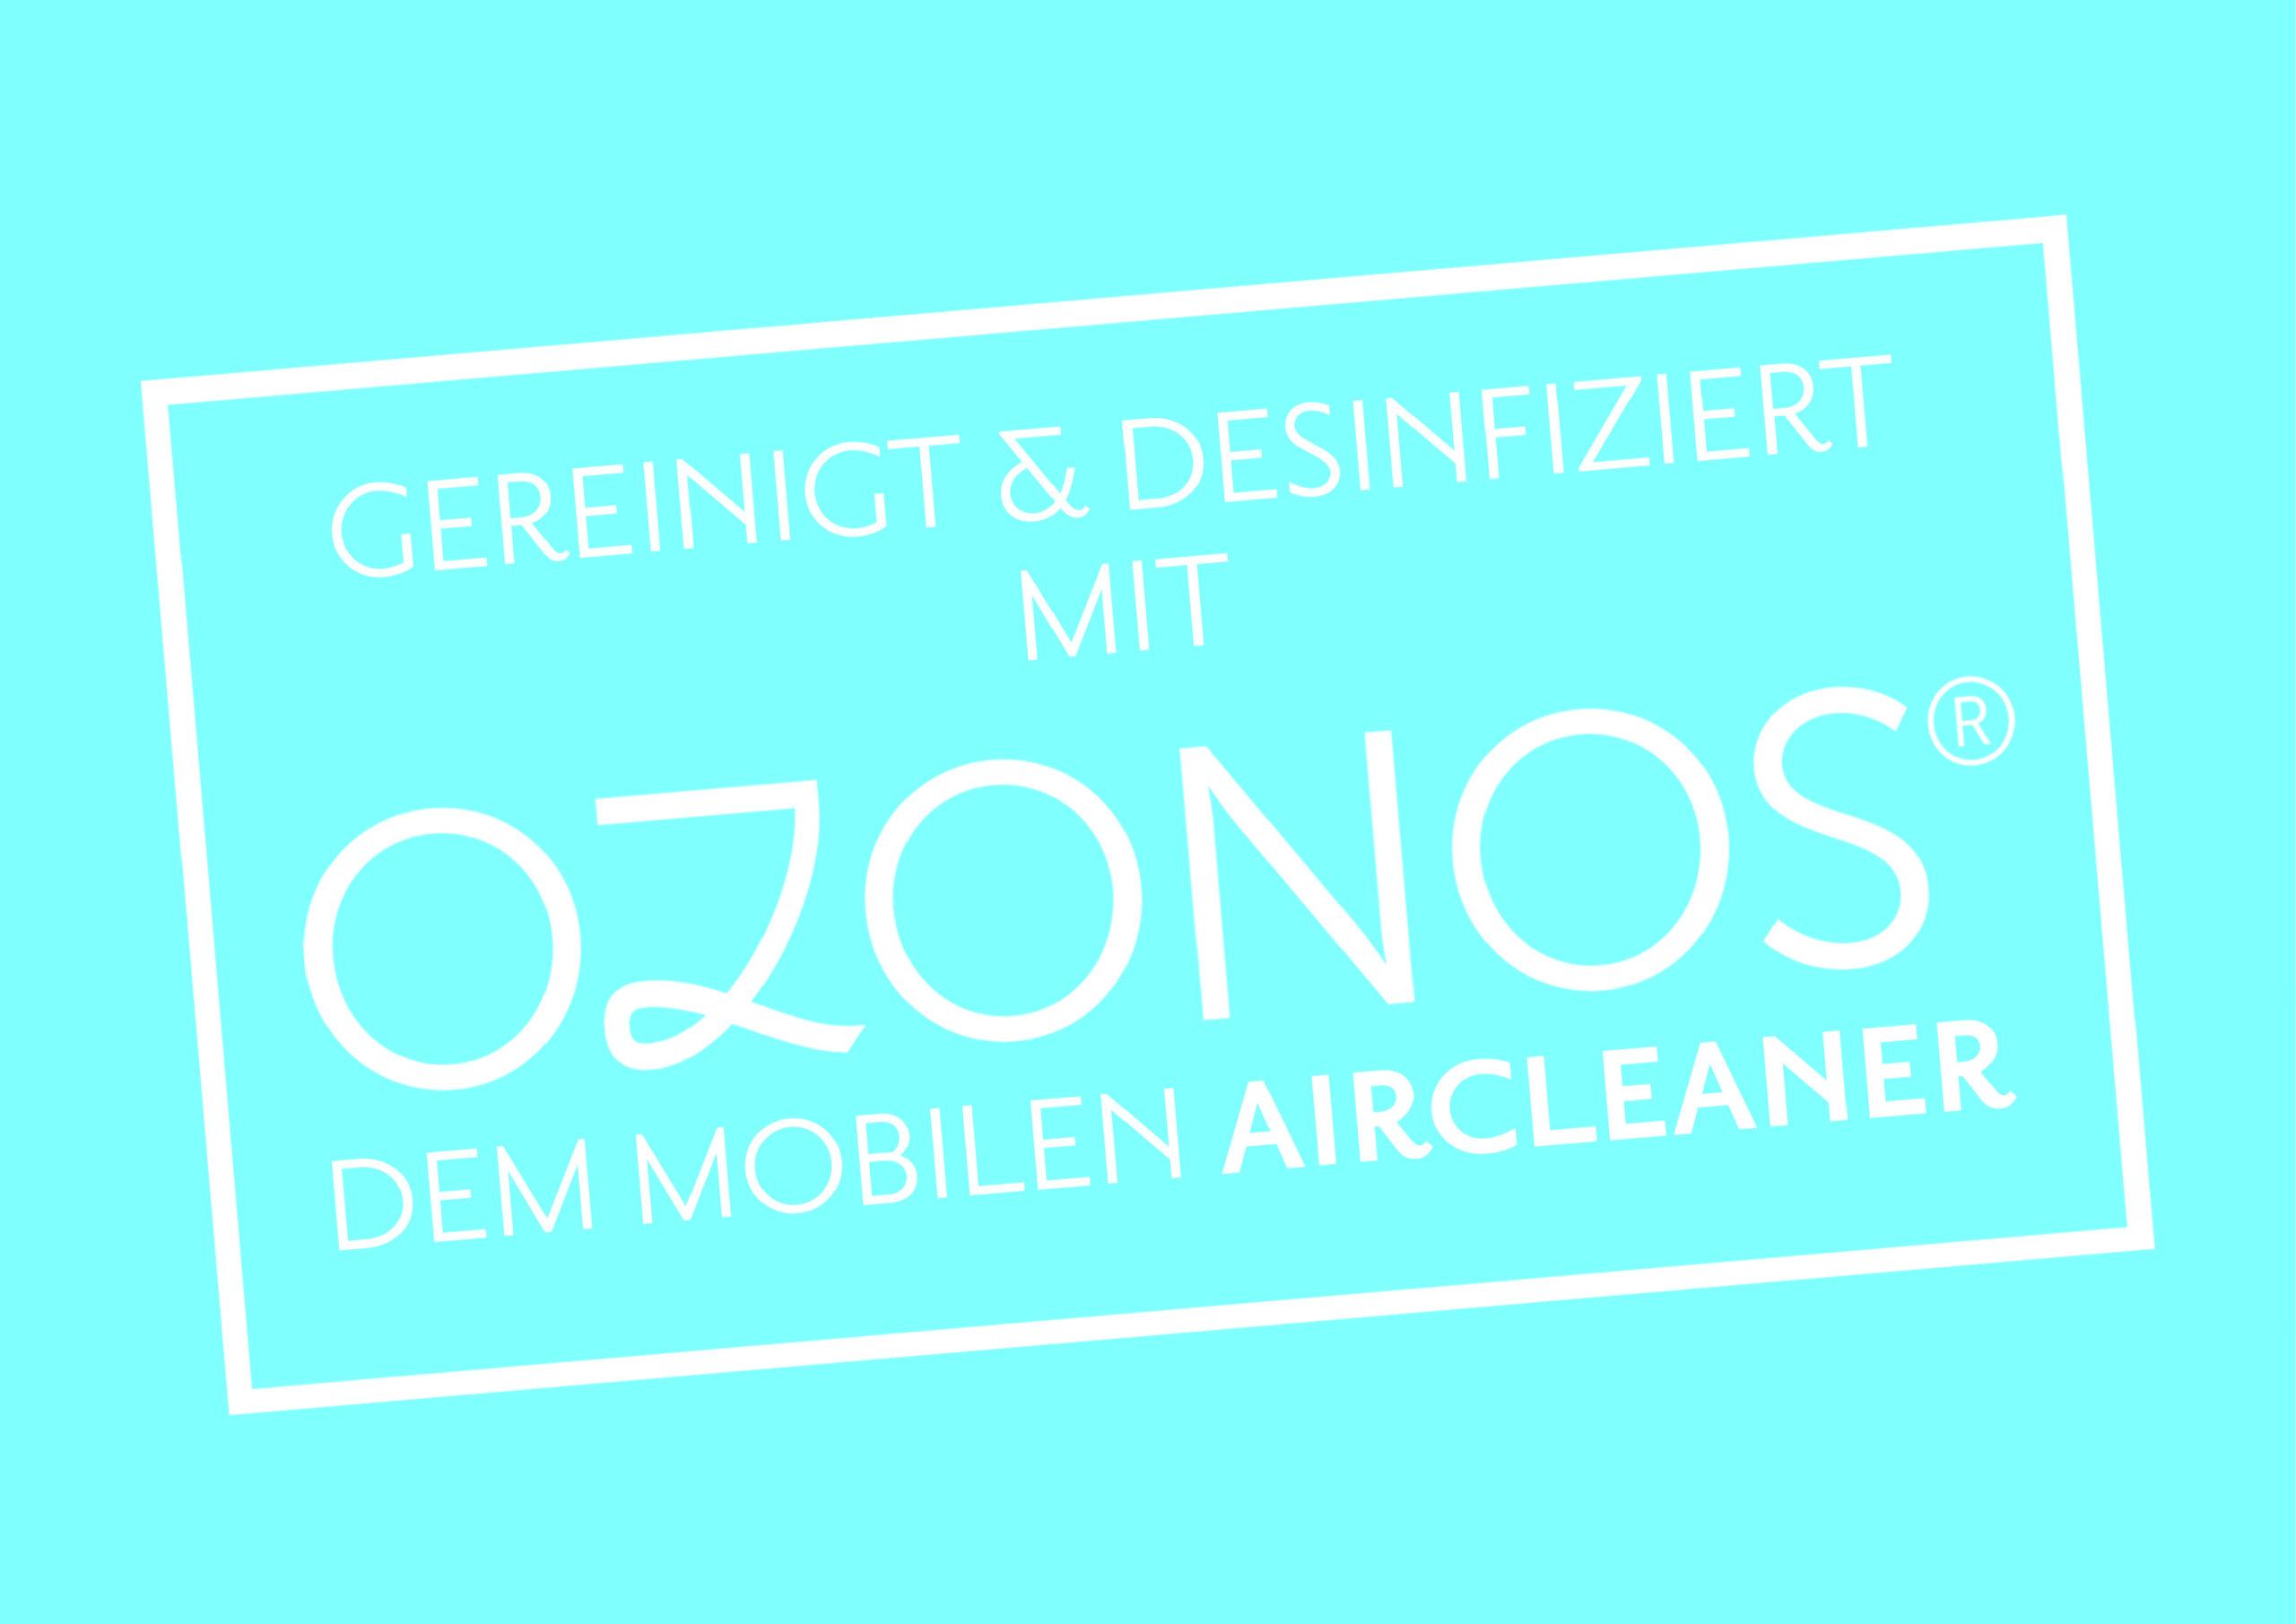 OZONOS Wohnmobilvermietung